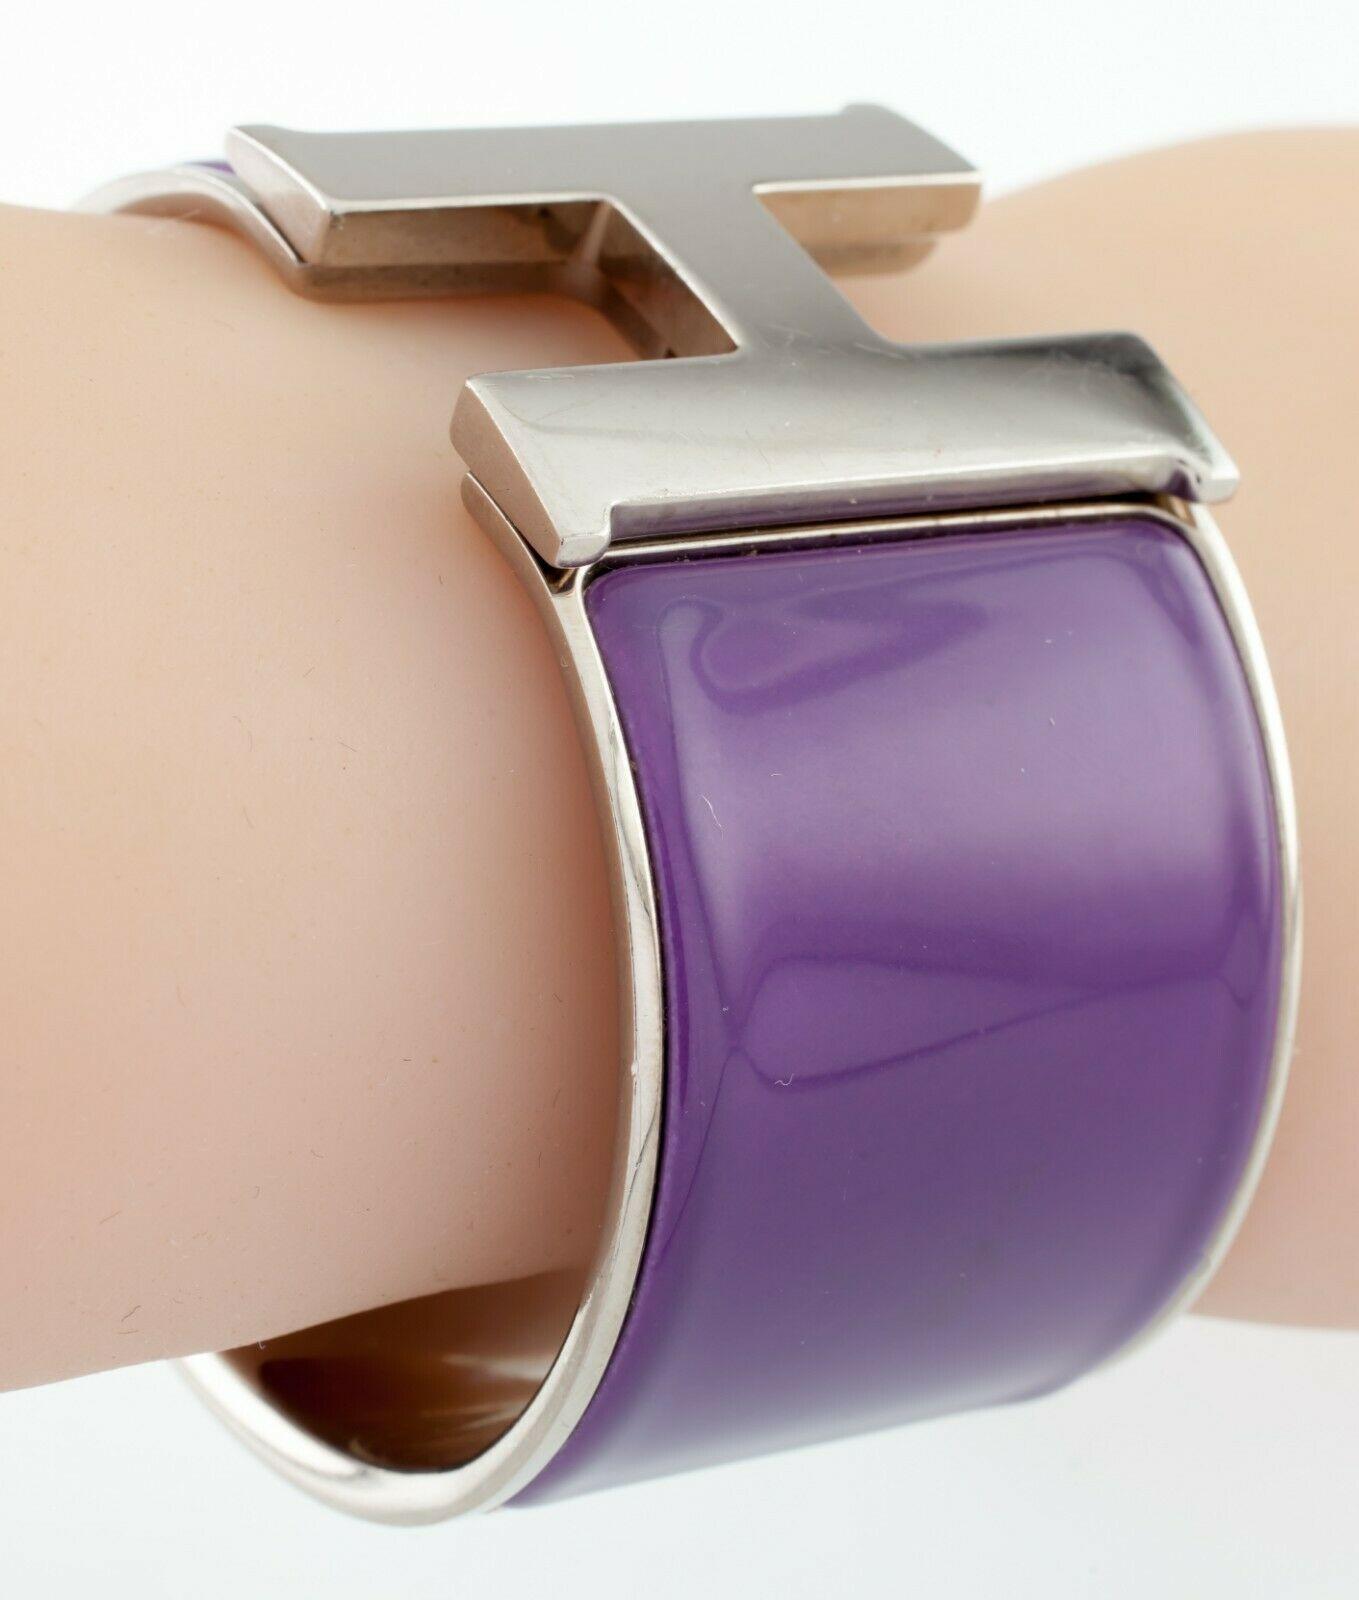 Hermes Clic Clac Violet Extra Large Bracelet Nice! image 3